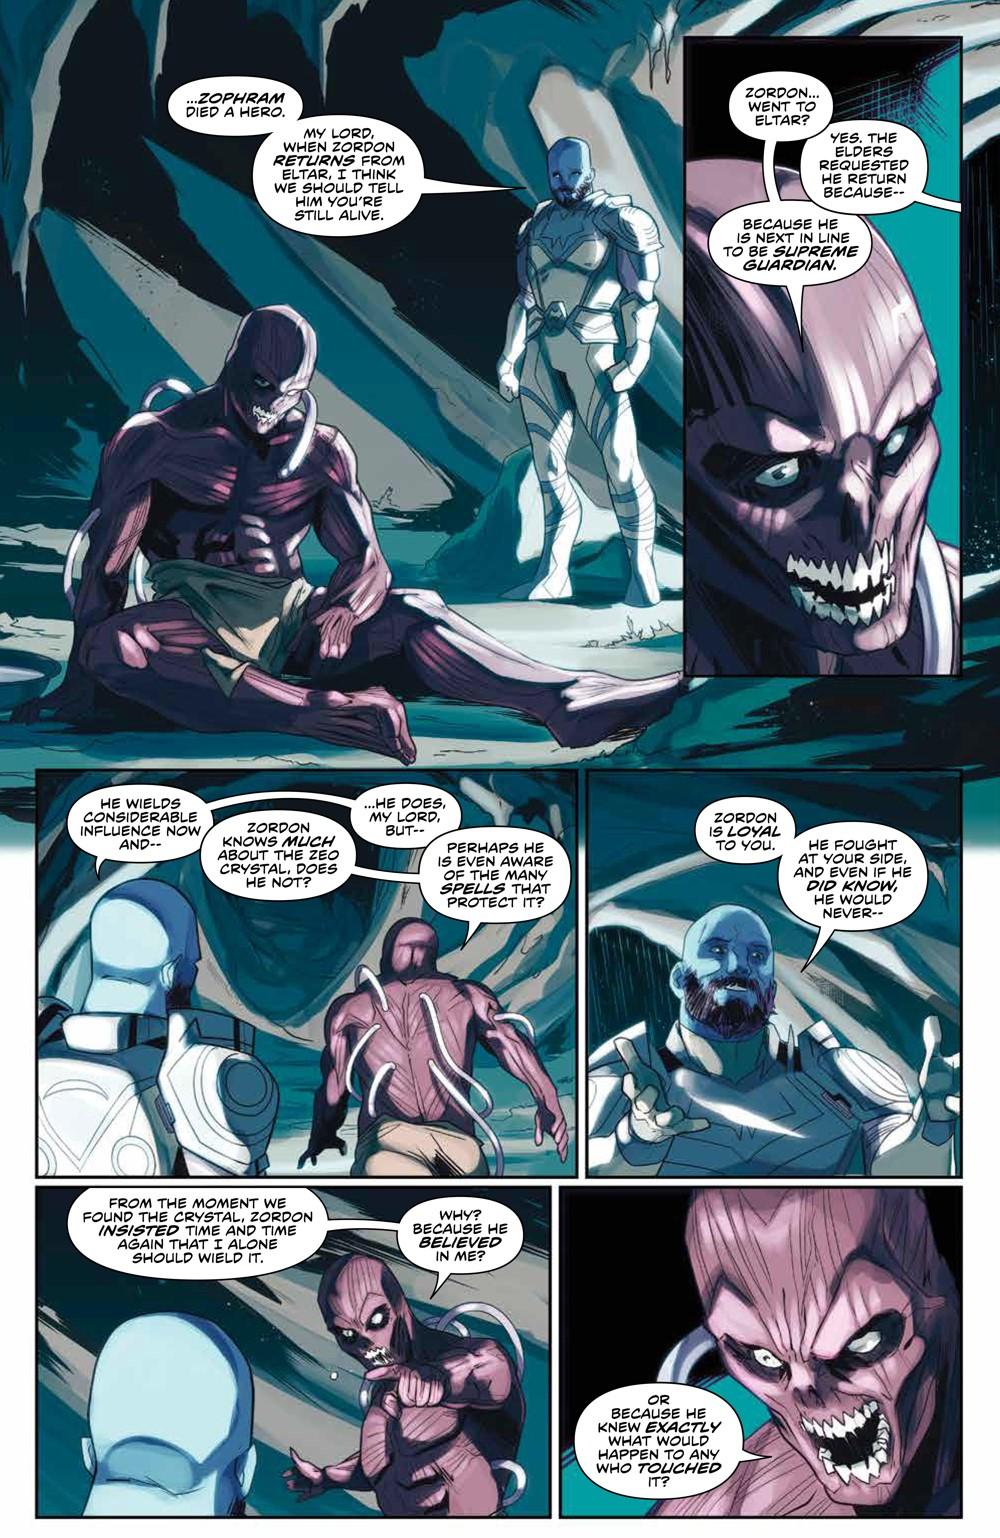 MightyMorphin_011_PRESS_4 ComicList Previews: MIGHTY MORPHIN #11